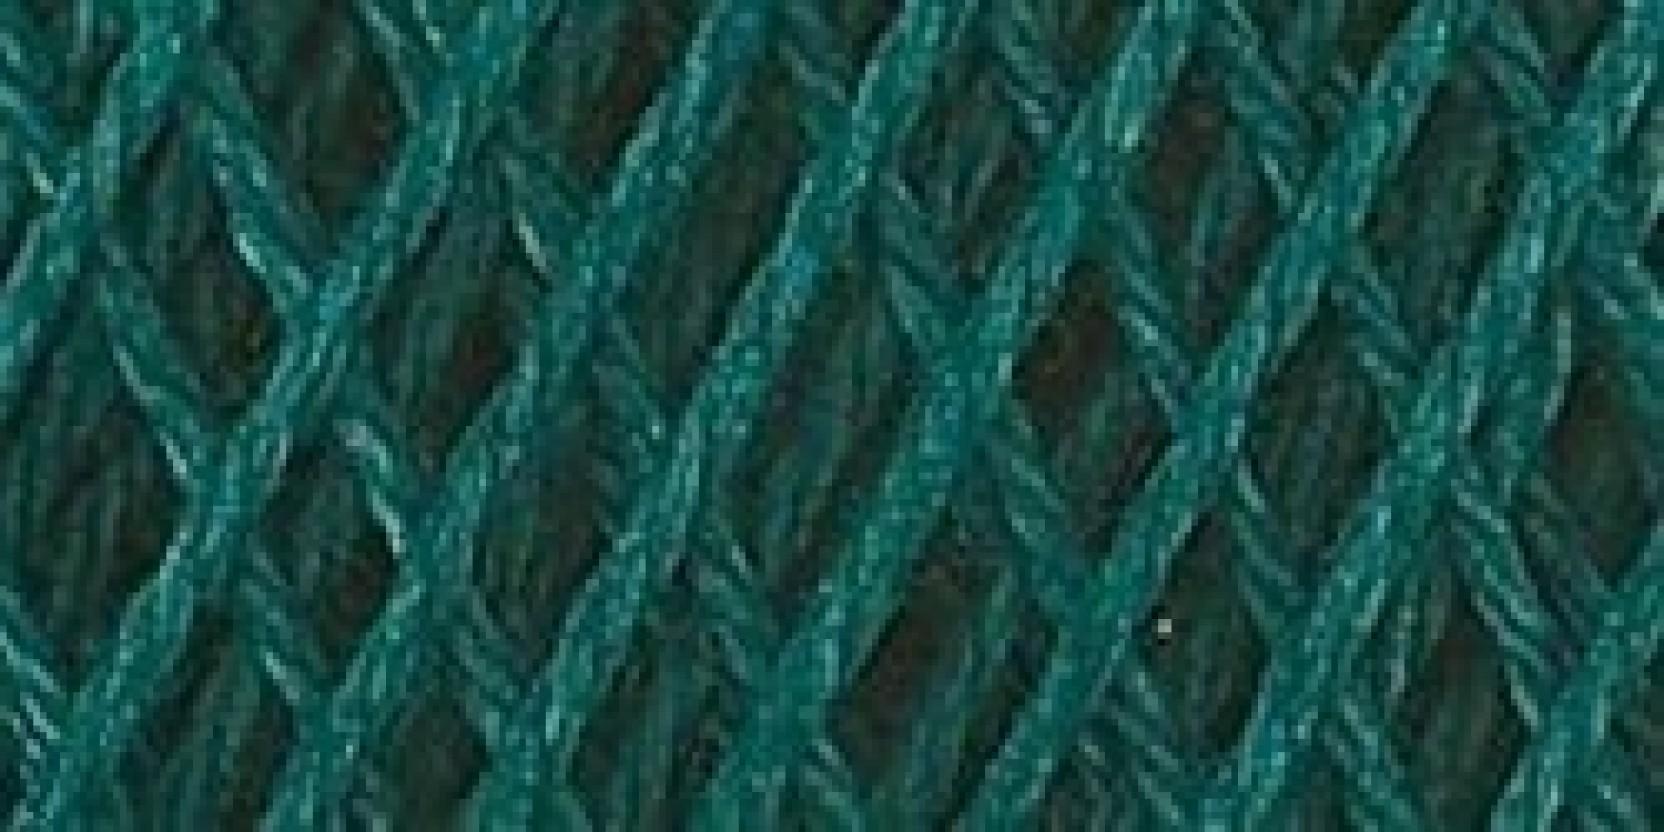 Coats Crochet South Maid Crochet Cotton Thread Size 10 Forest